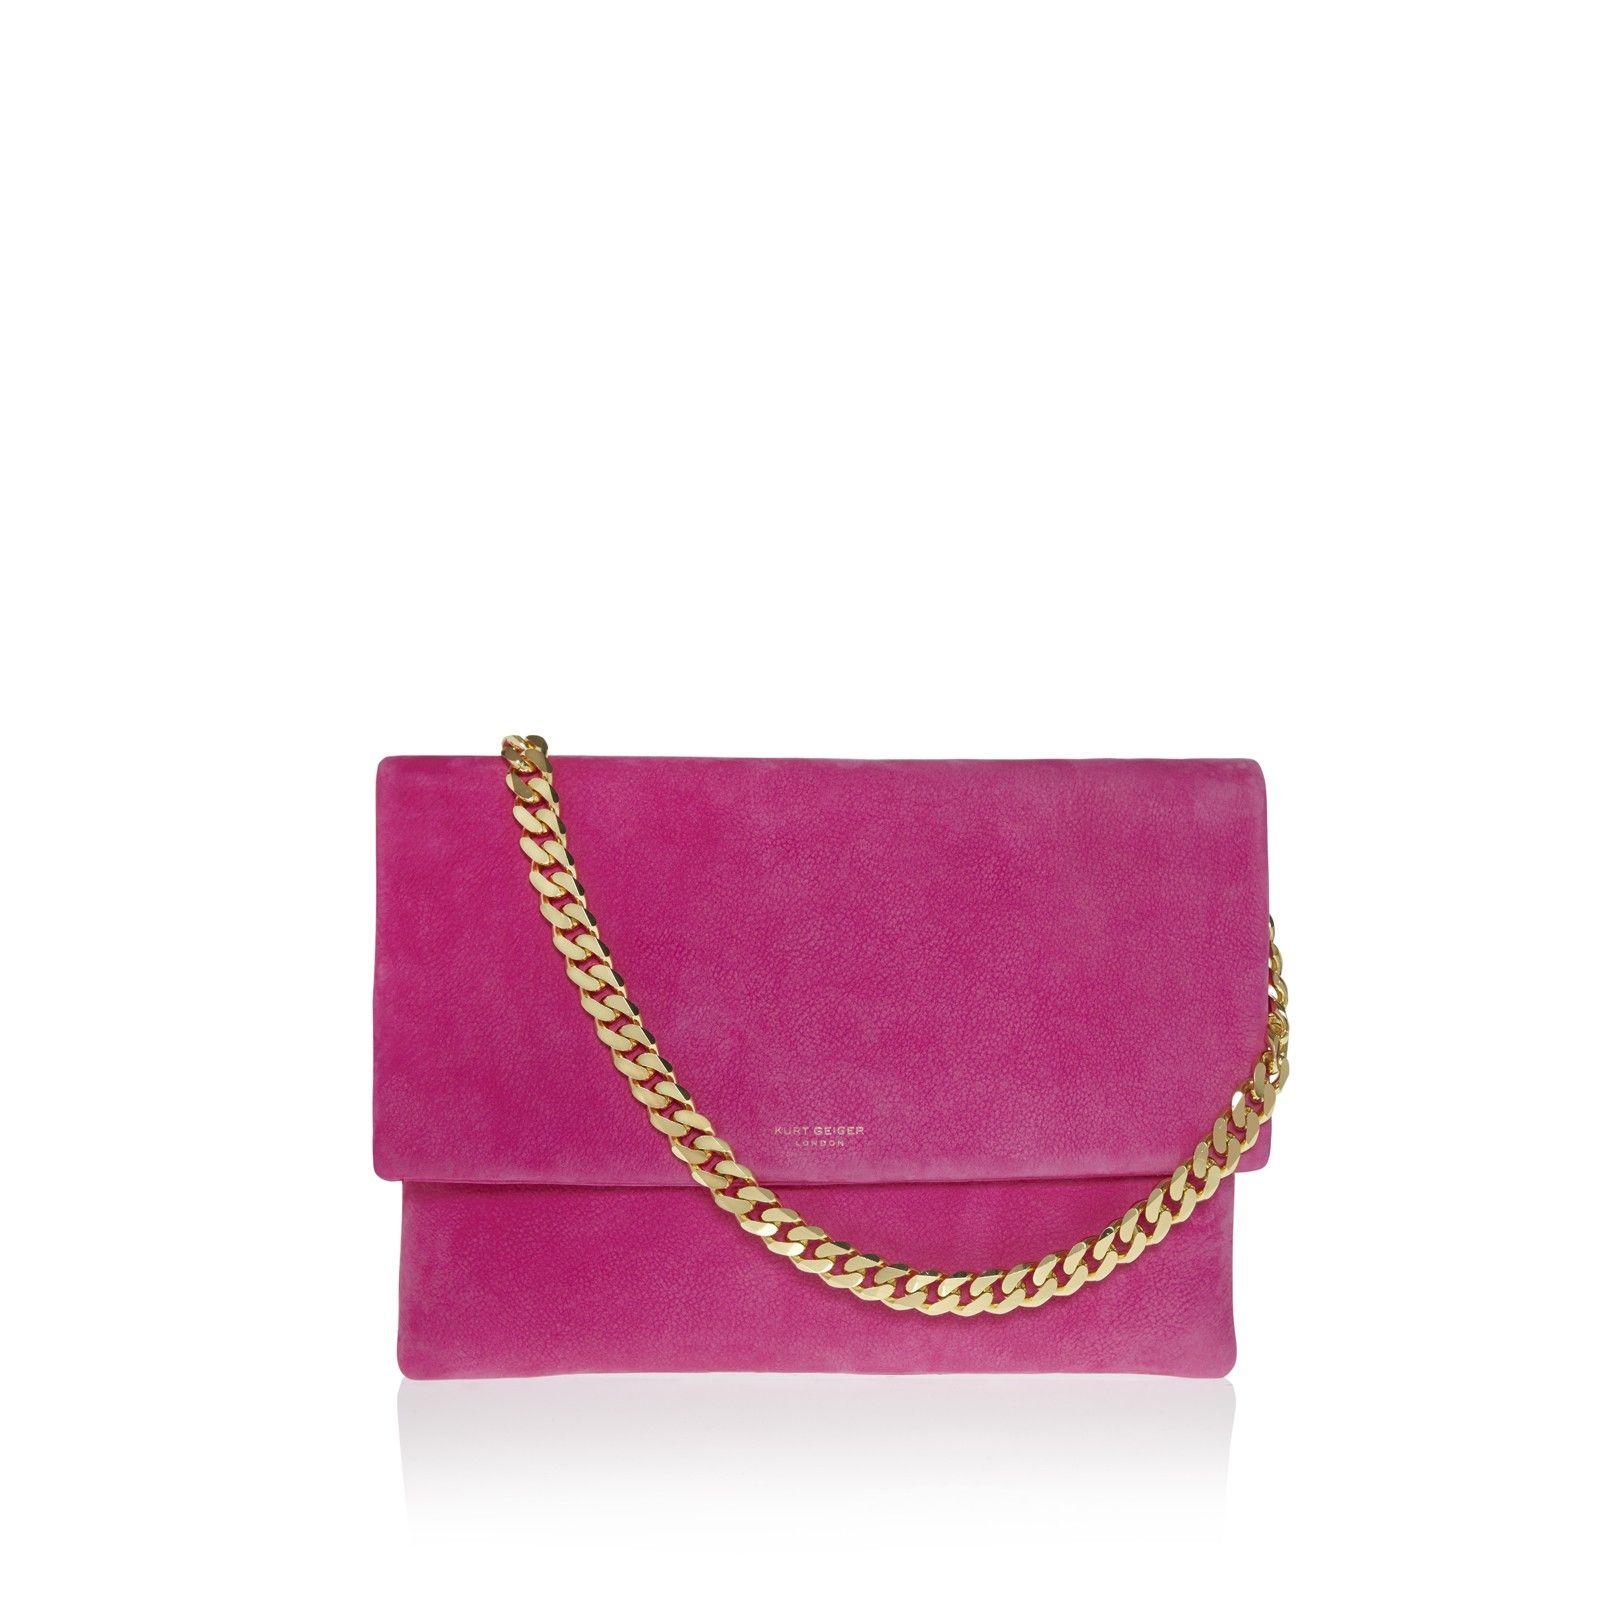 octane fold over bag, pink accessory by kurt geiger london - bags clutch bags